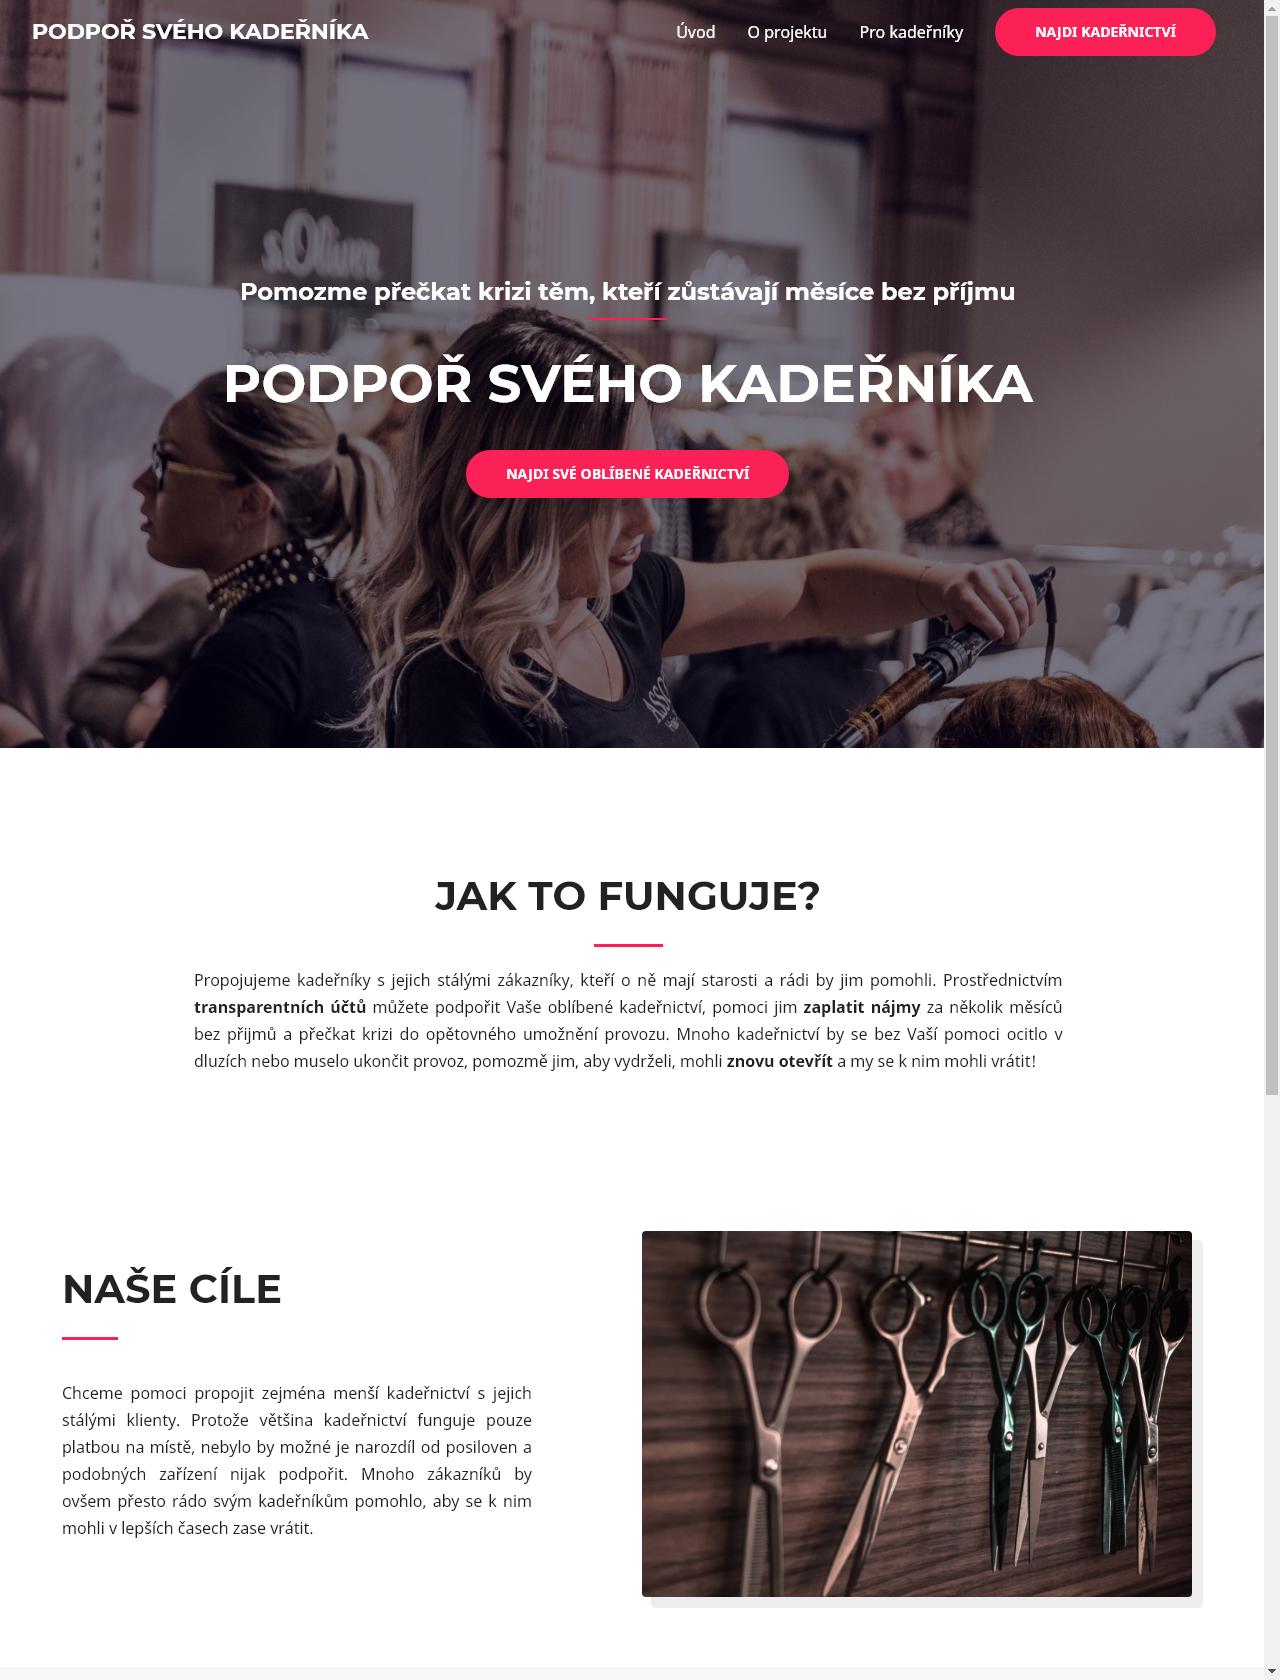 Screenshot Desktop - https://podporsvehokadernika.cz/